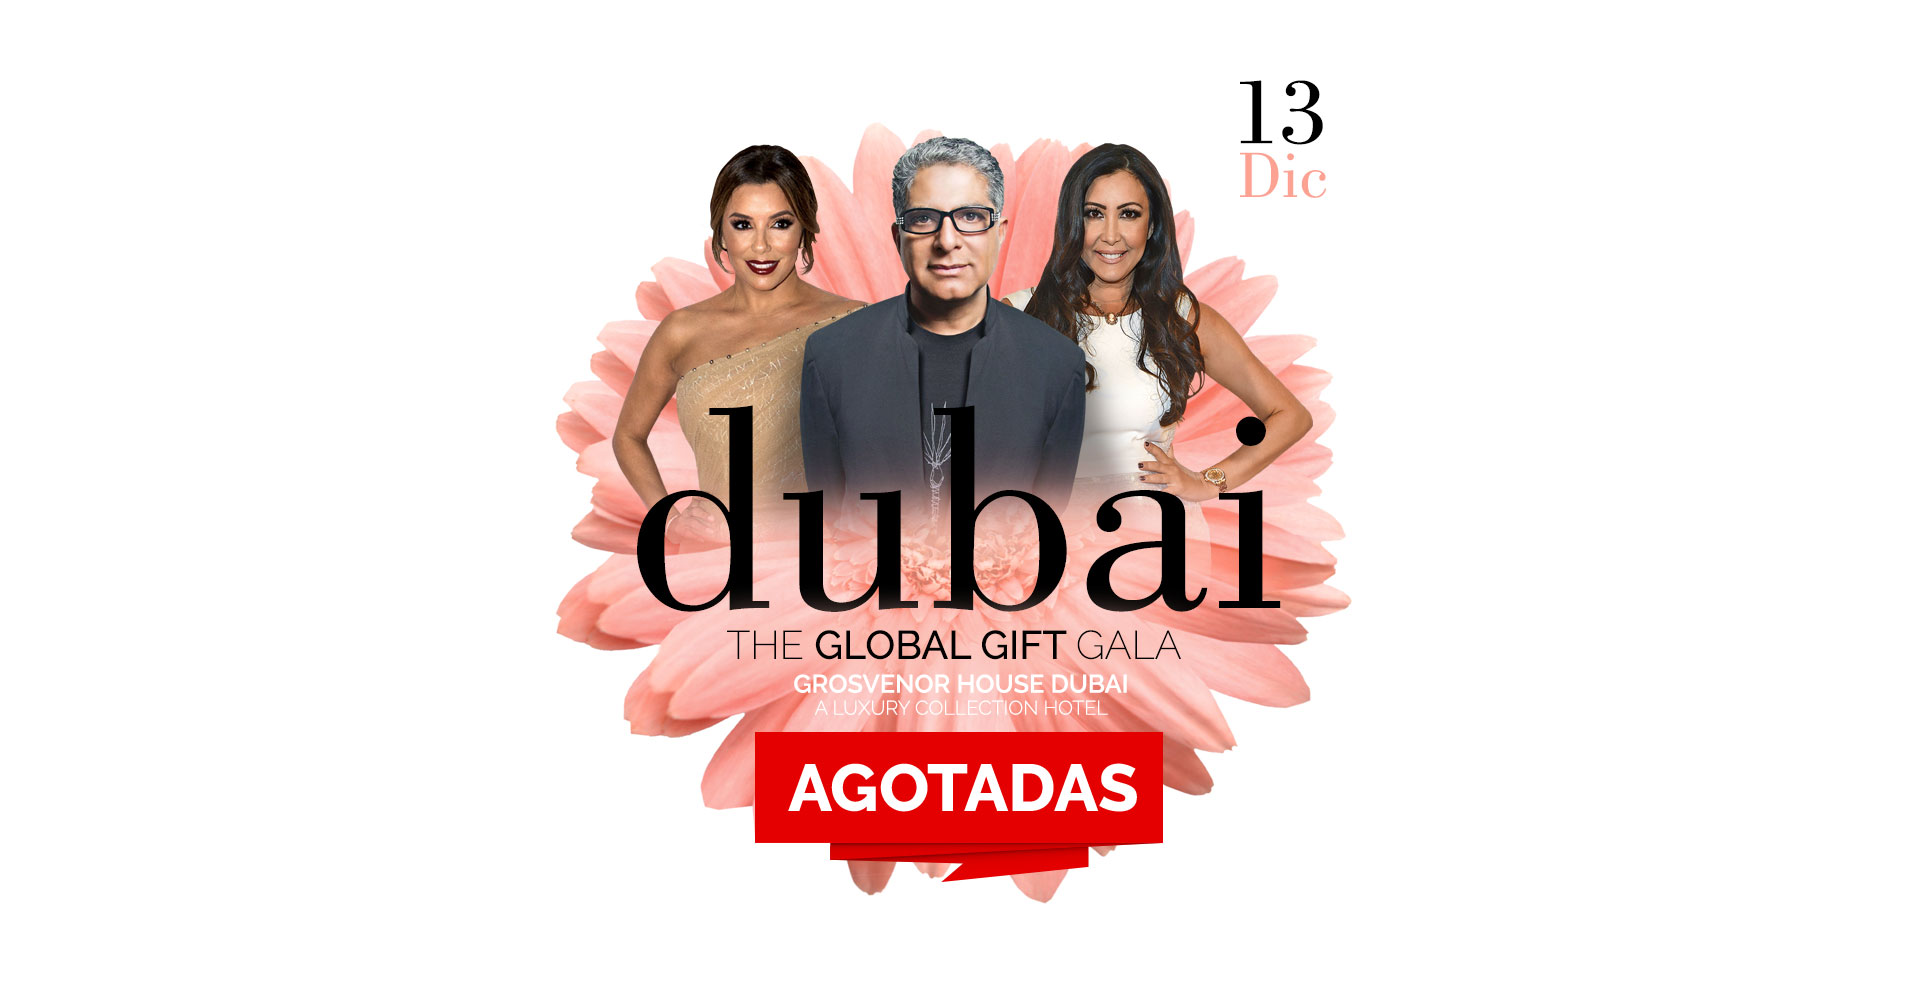 Global Gift Gala Dubai 2018 Agotadas